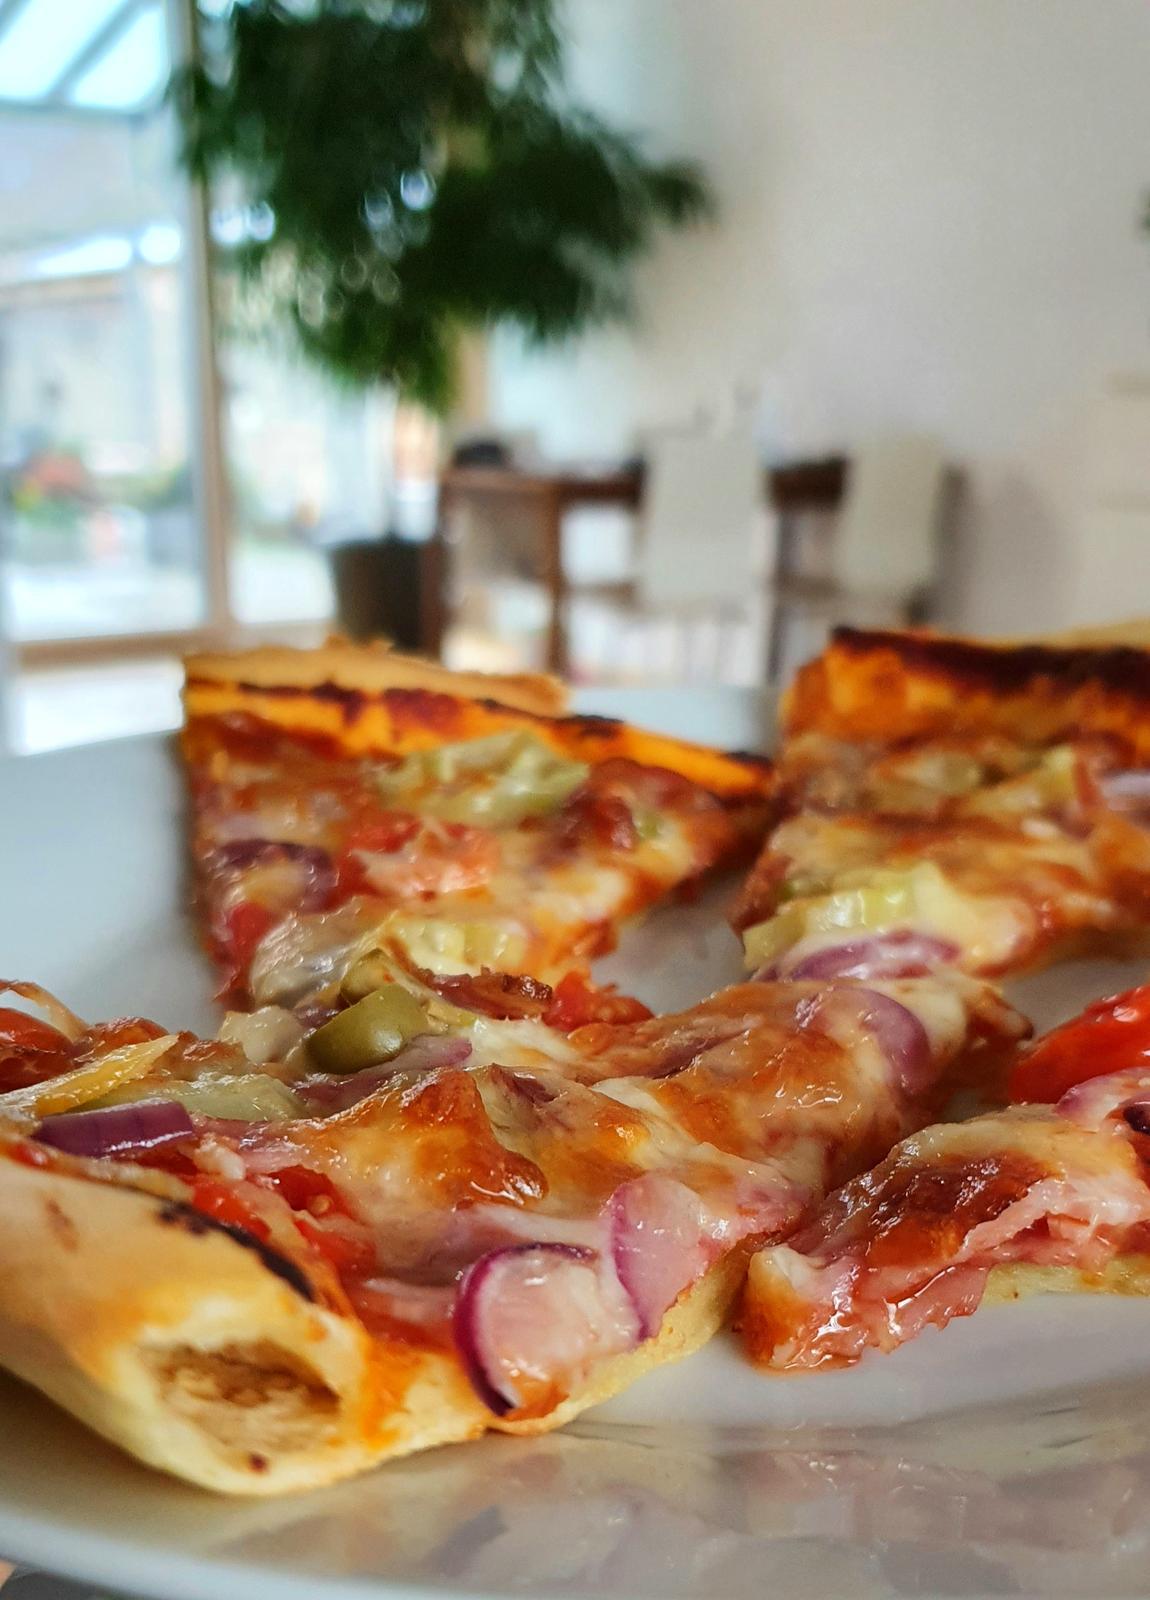 T-éčko po roku 🏡 - Volny den a kvaskova pizza :-)